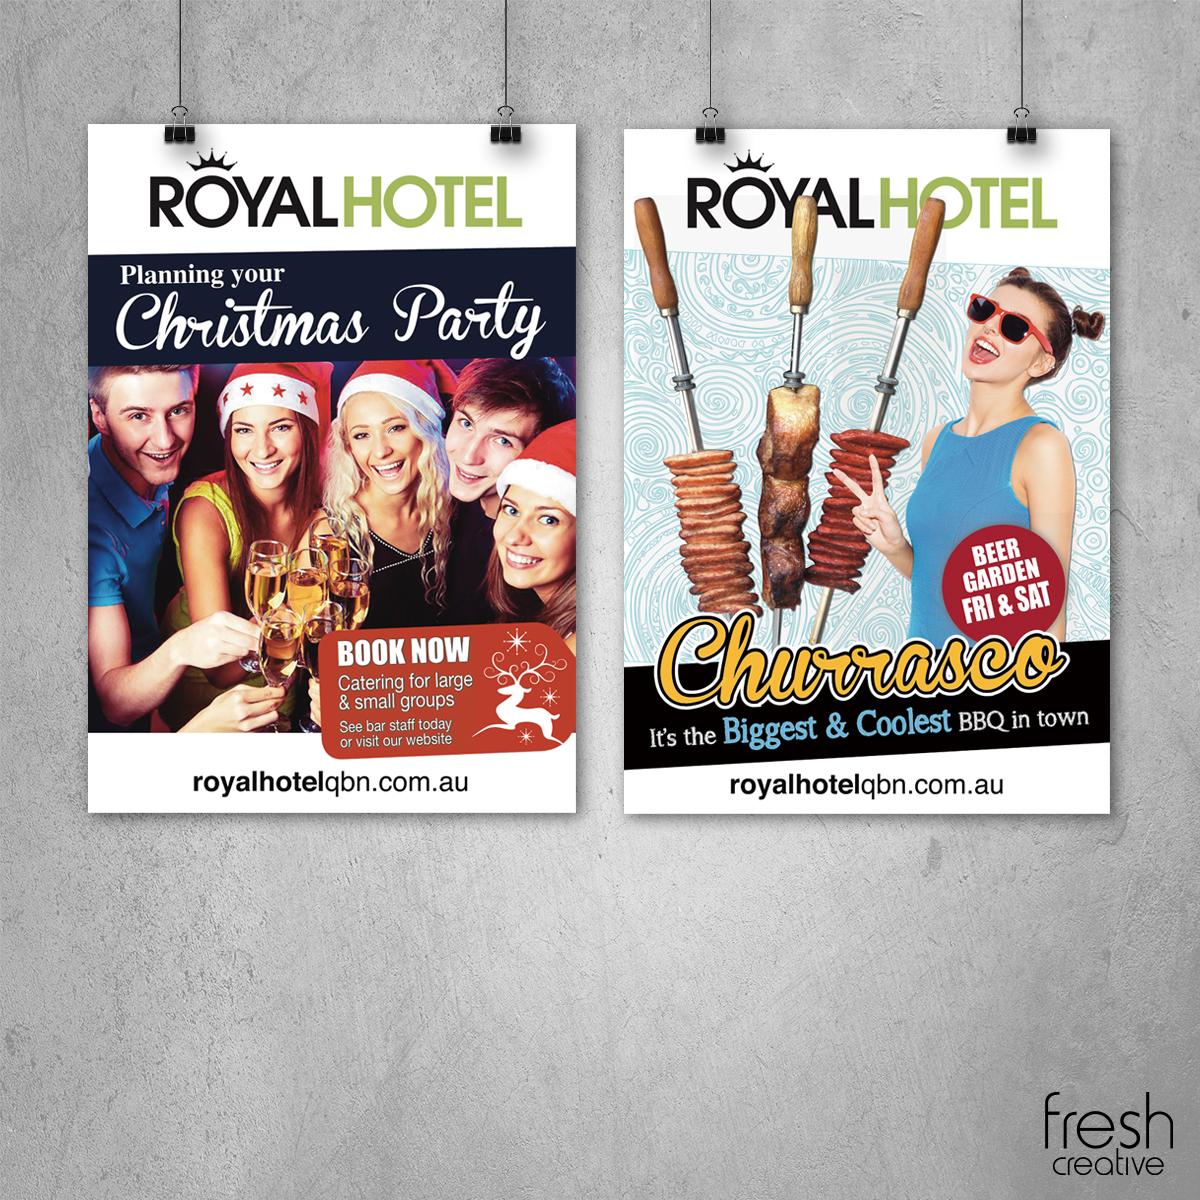 Royal Hotel Queanbeyan Posters